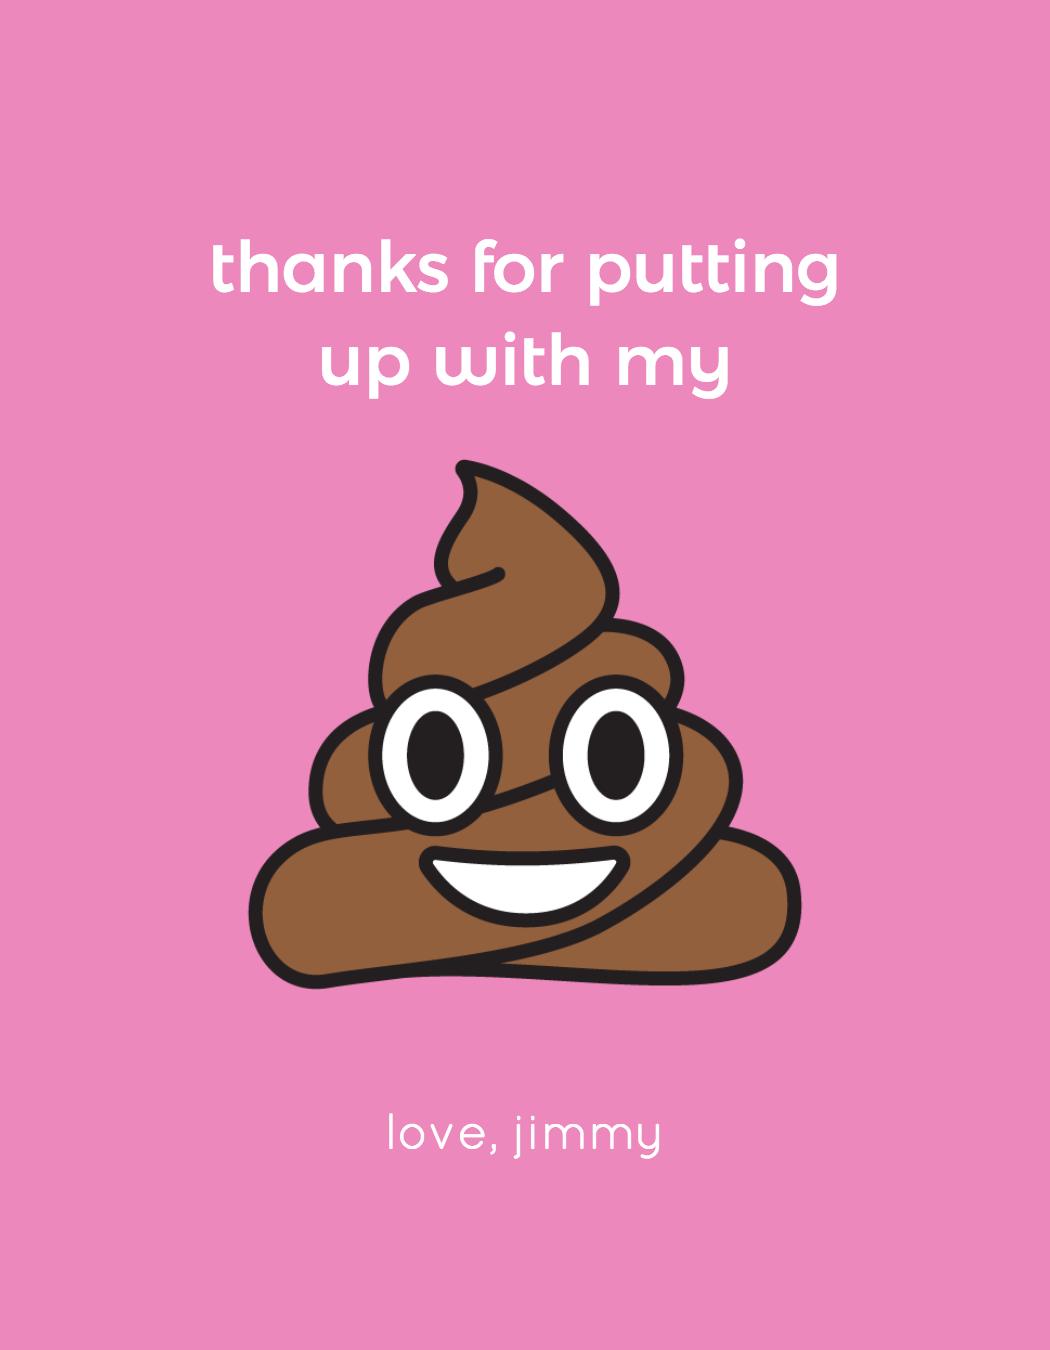 wine label with a poop emoji